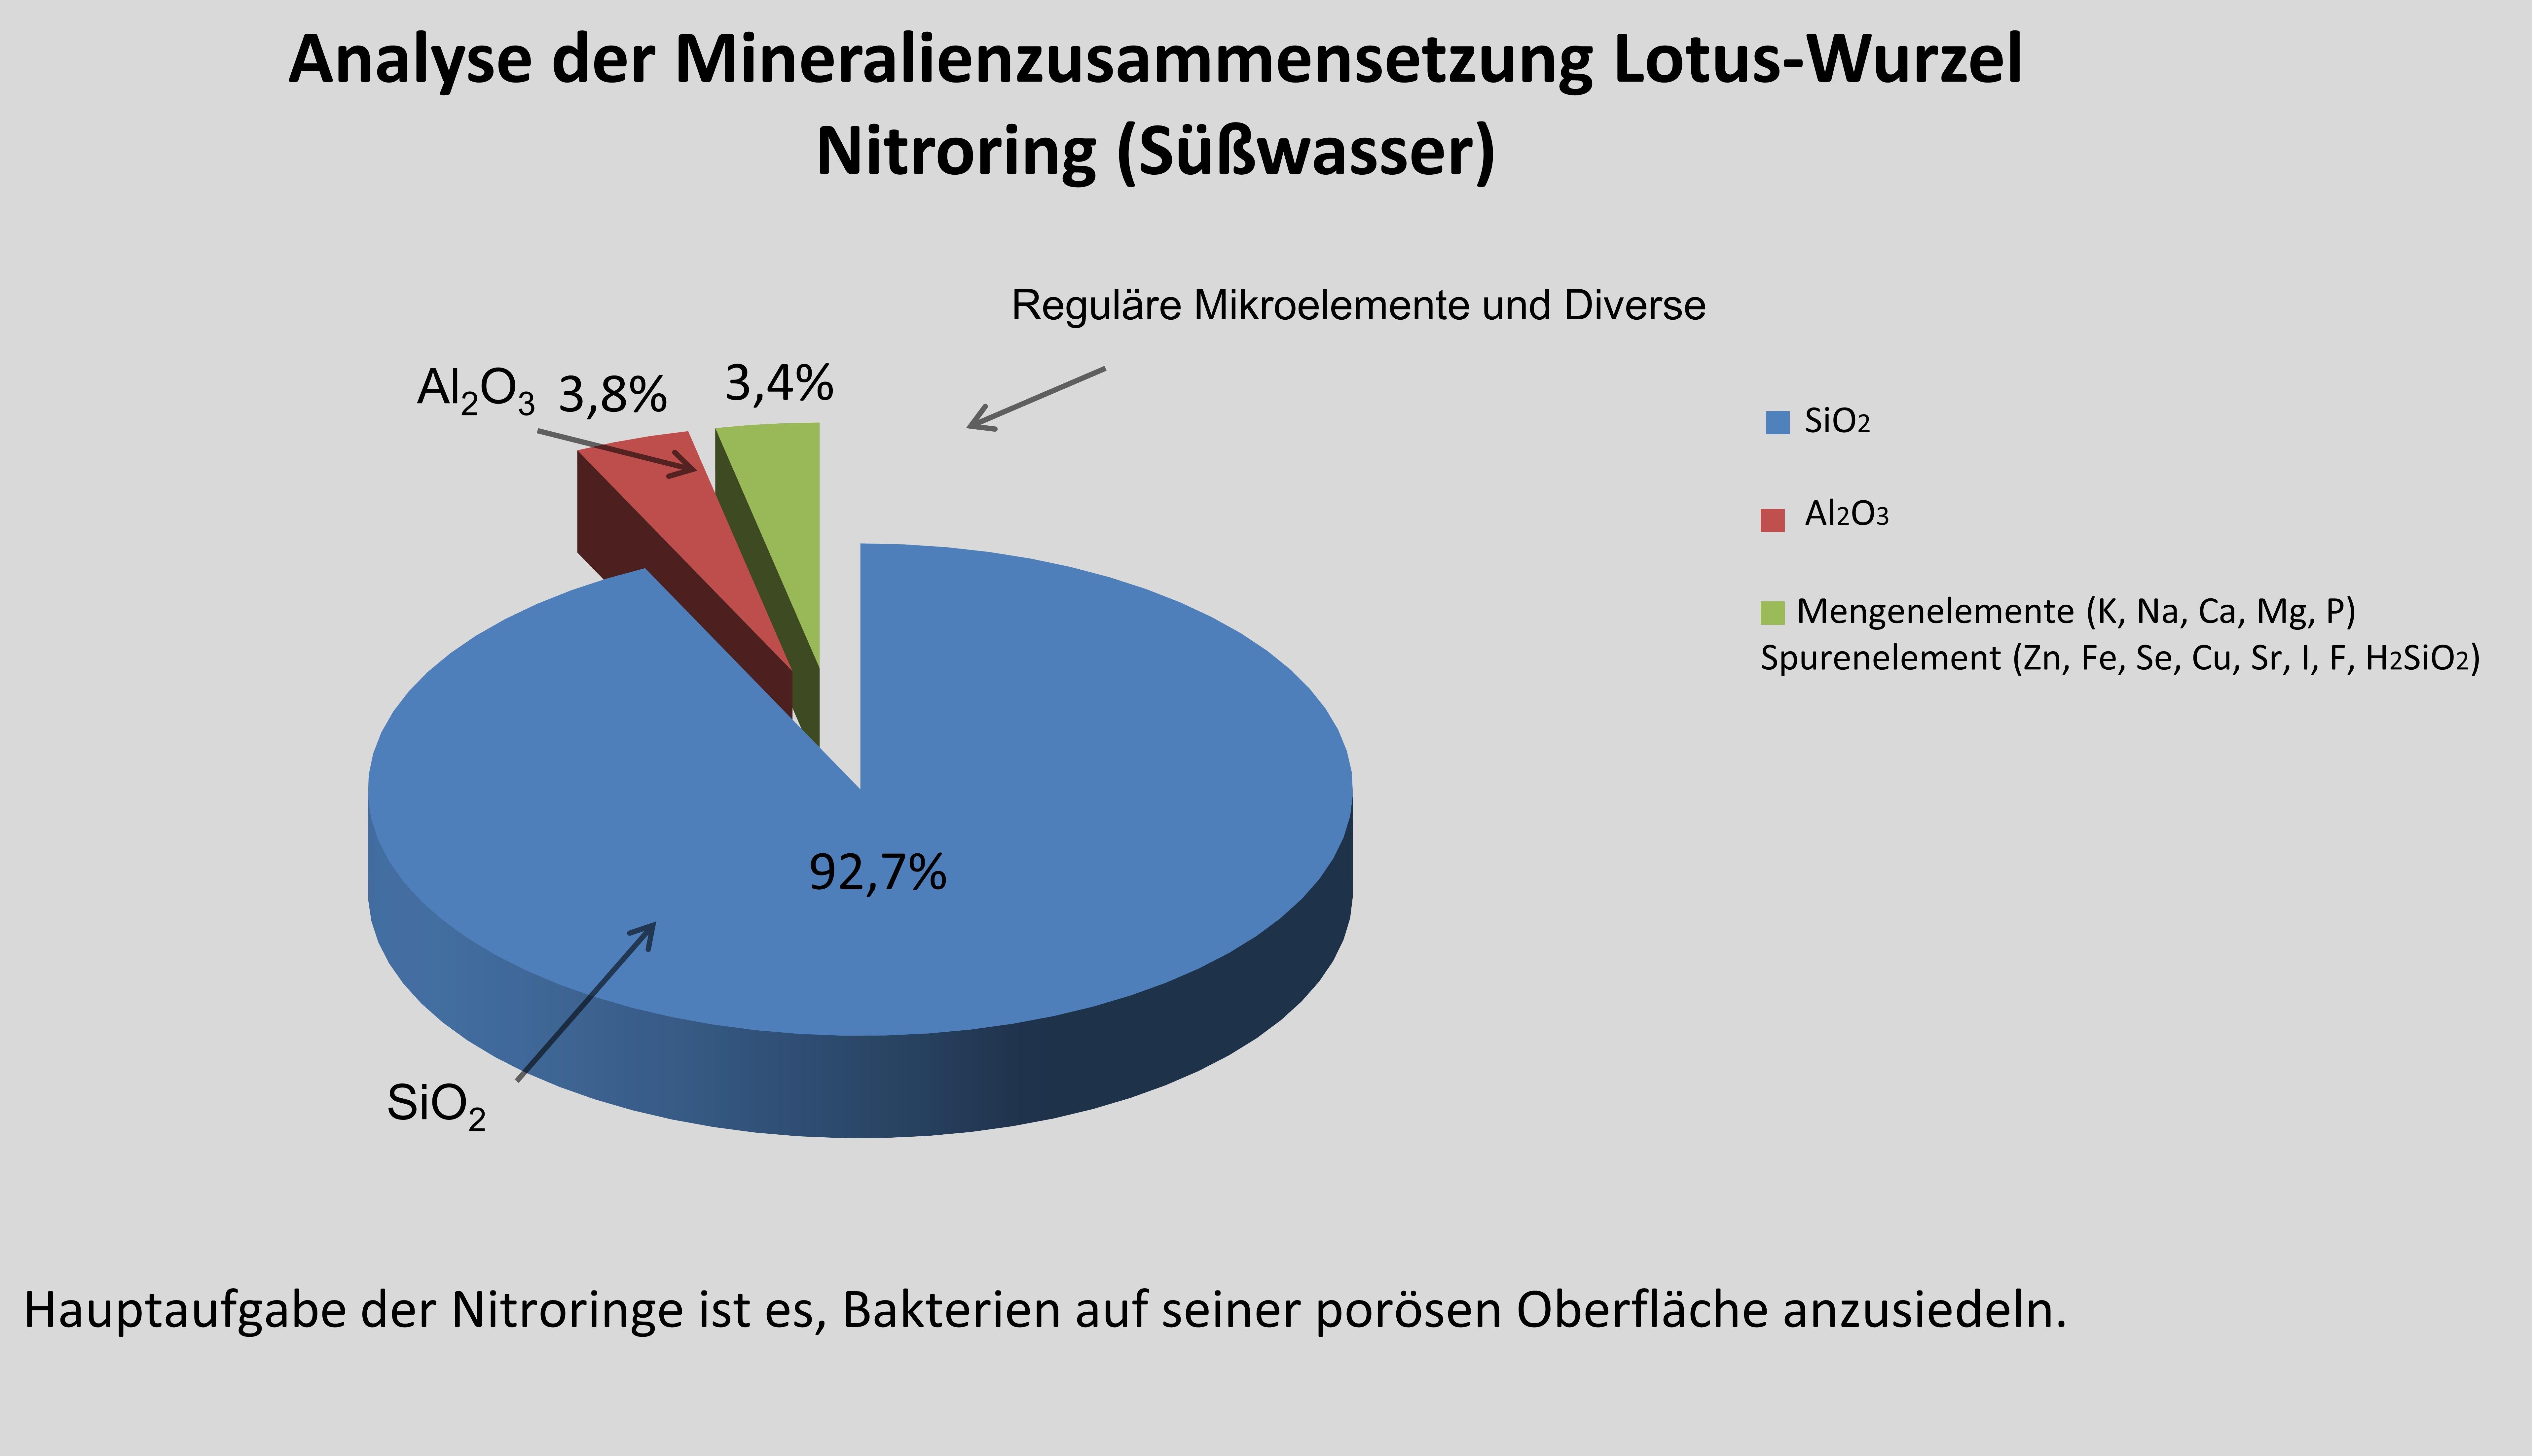 Mineralien_Lotus-Wurzel_Nitroring_suesswasserFwA8xgk1pPiuK